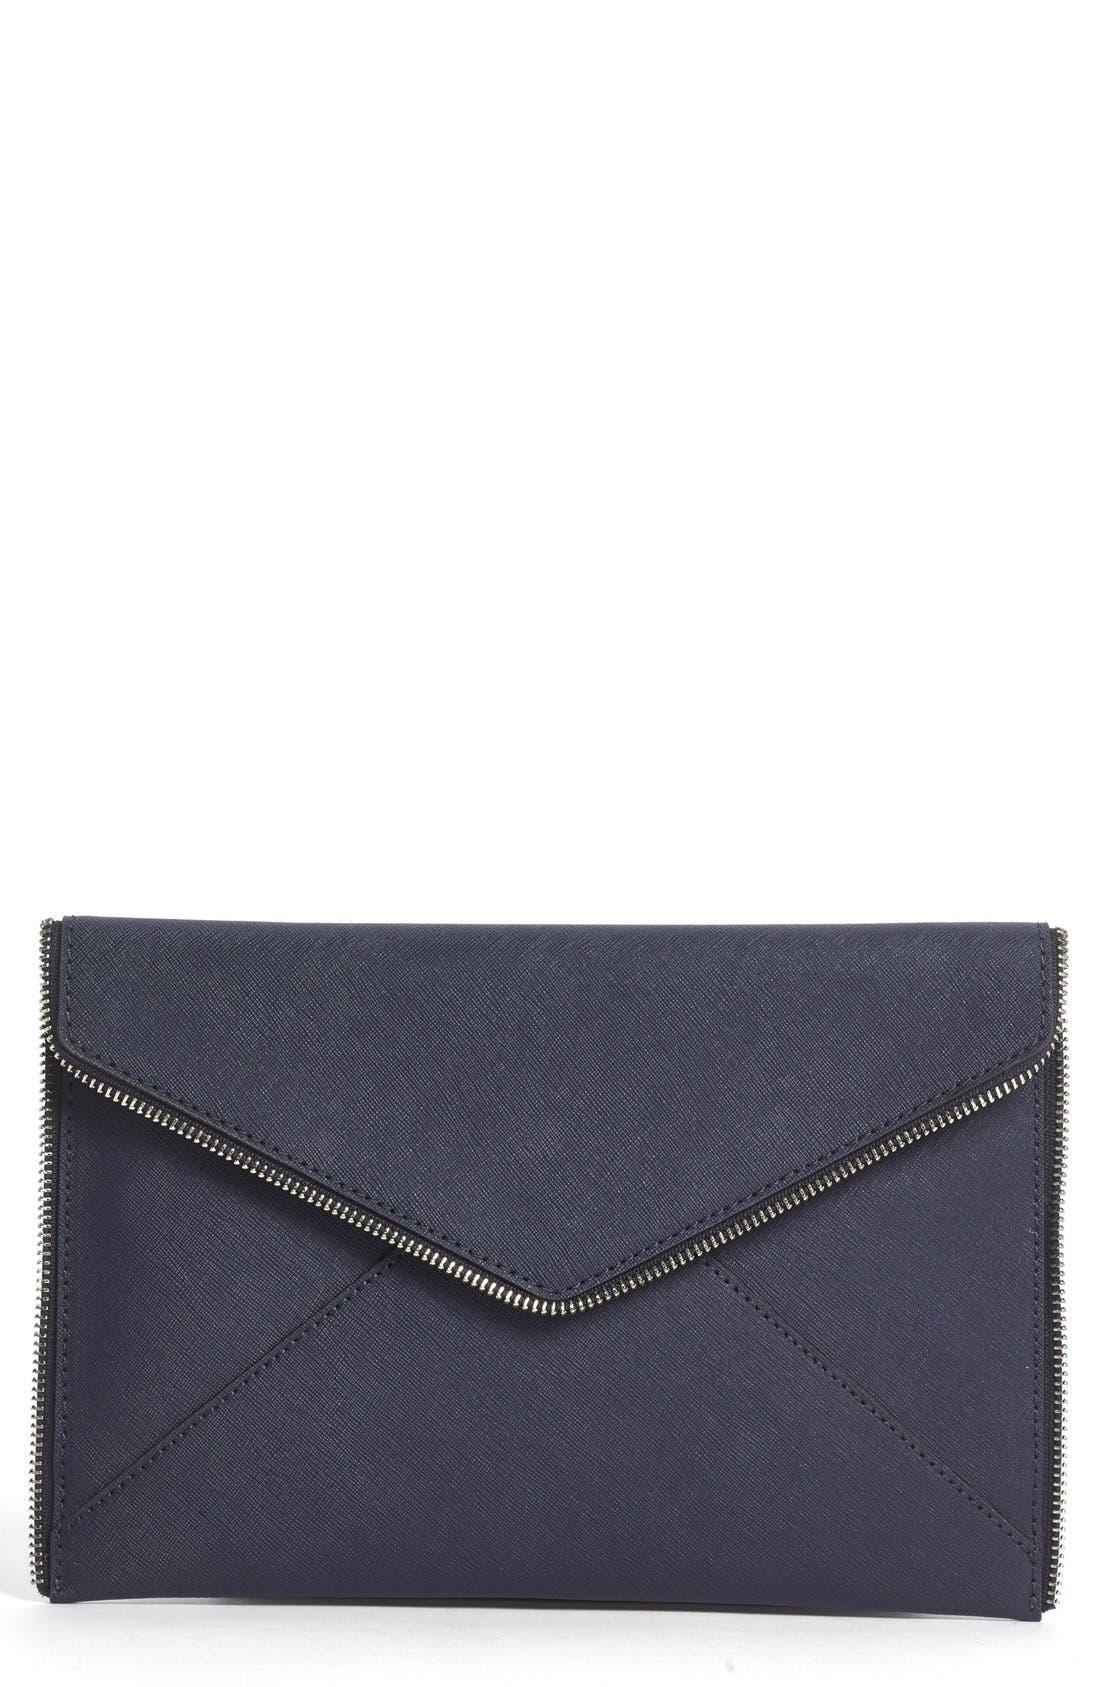 REBECCA MINKOFF 'Leo' Envelope Clutch, Main, color, 400